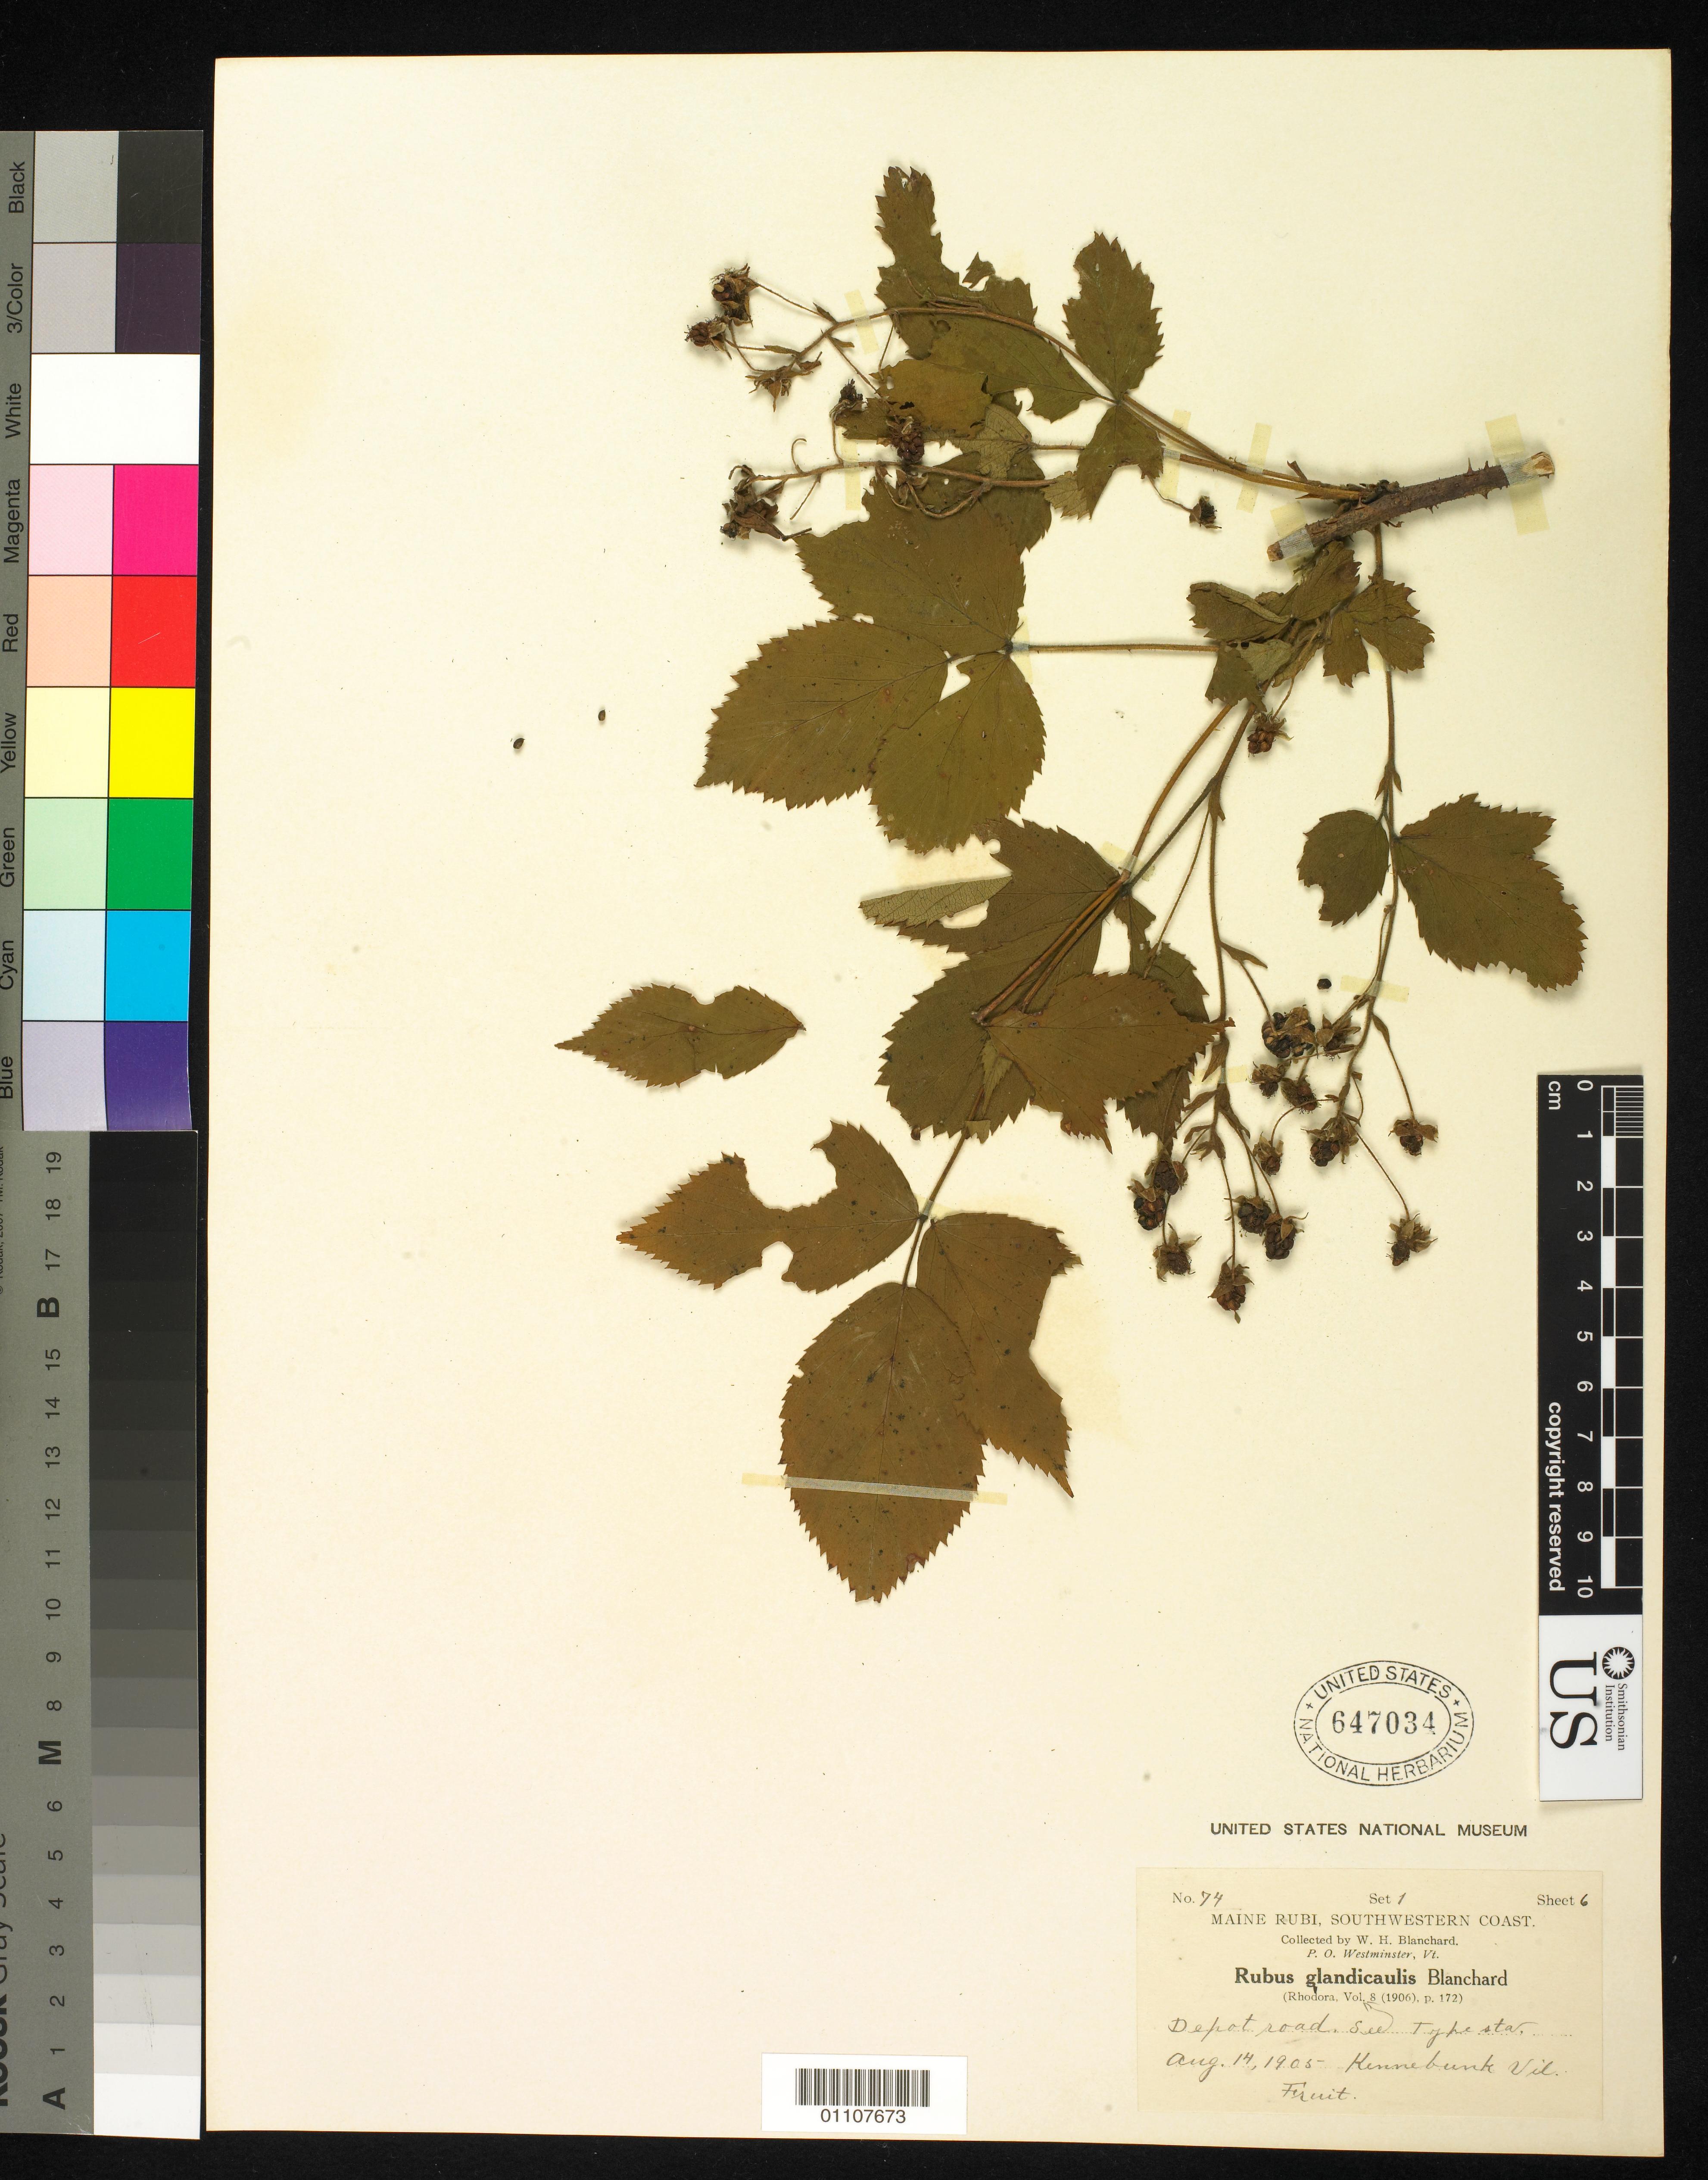 Rubus glandicaulis Blanch.